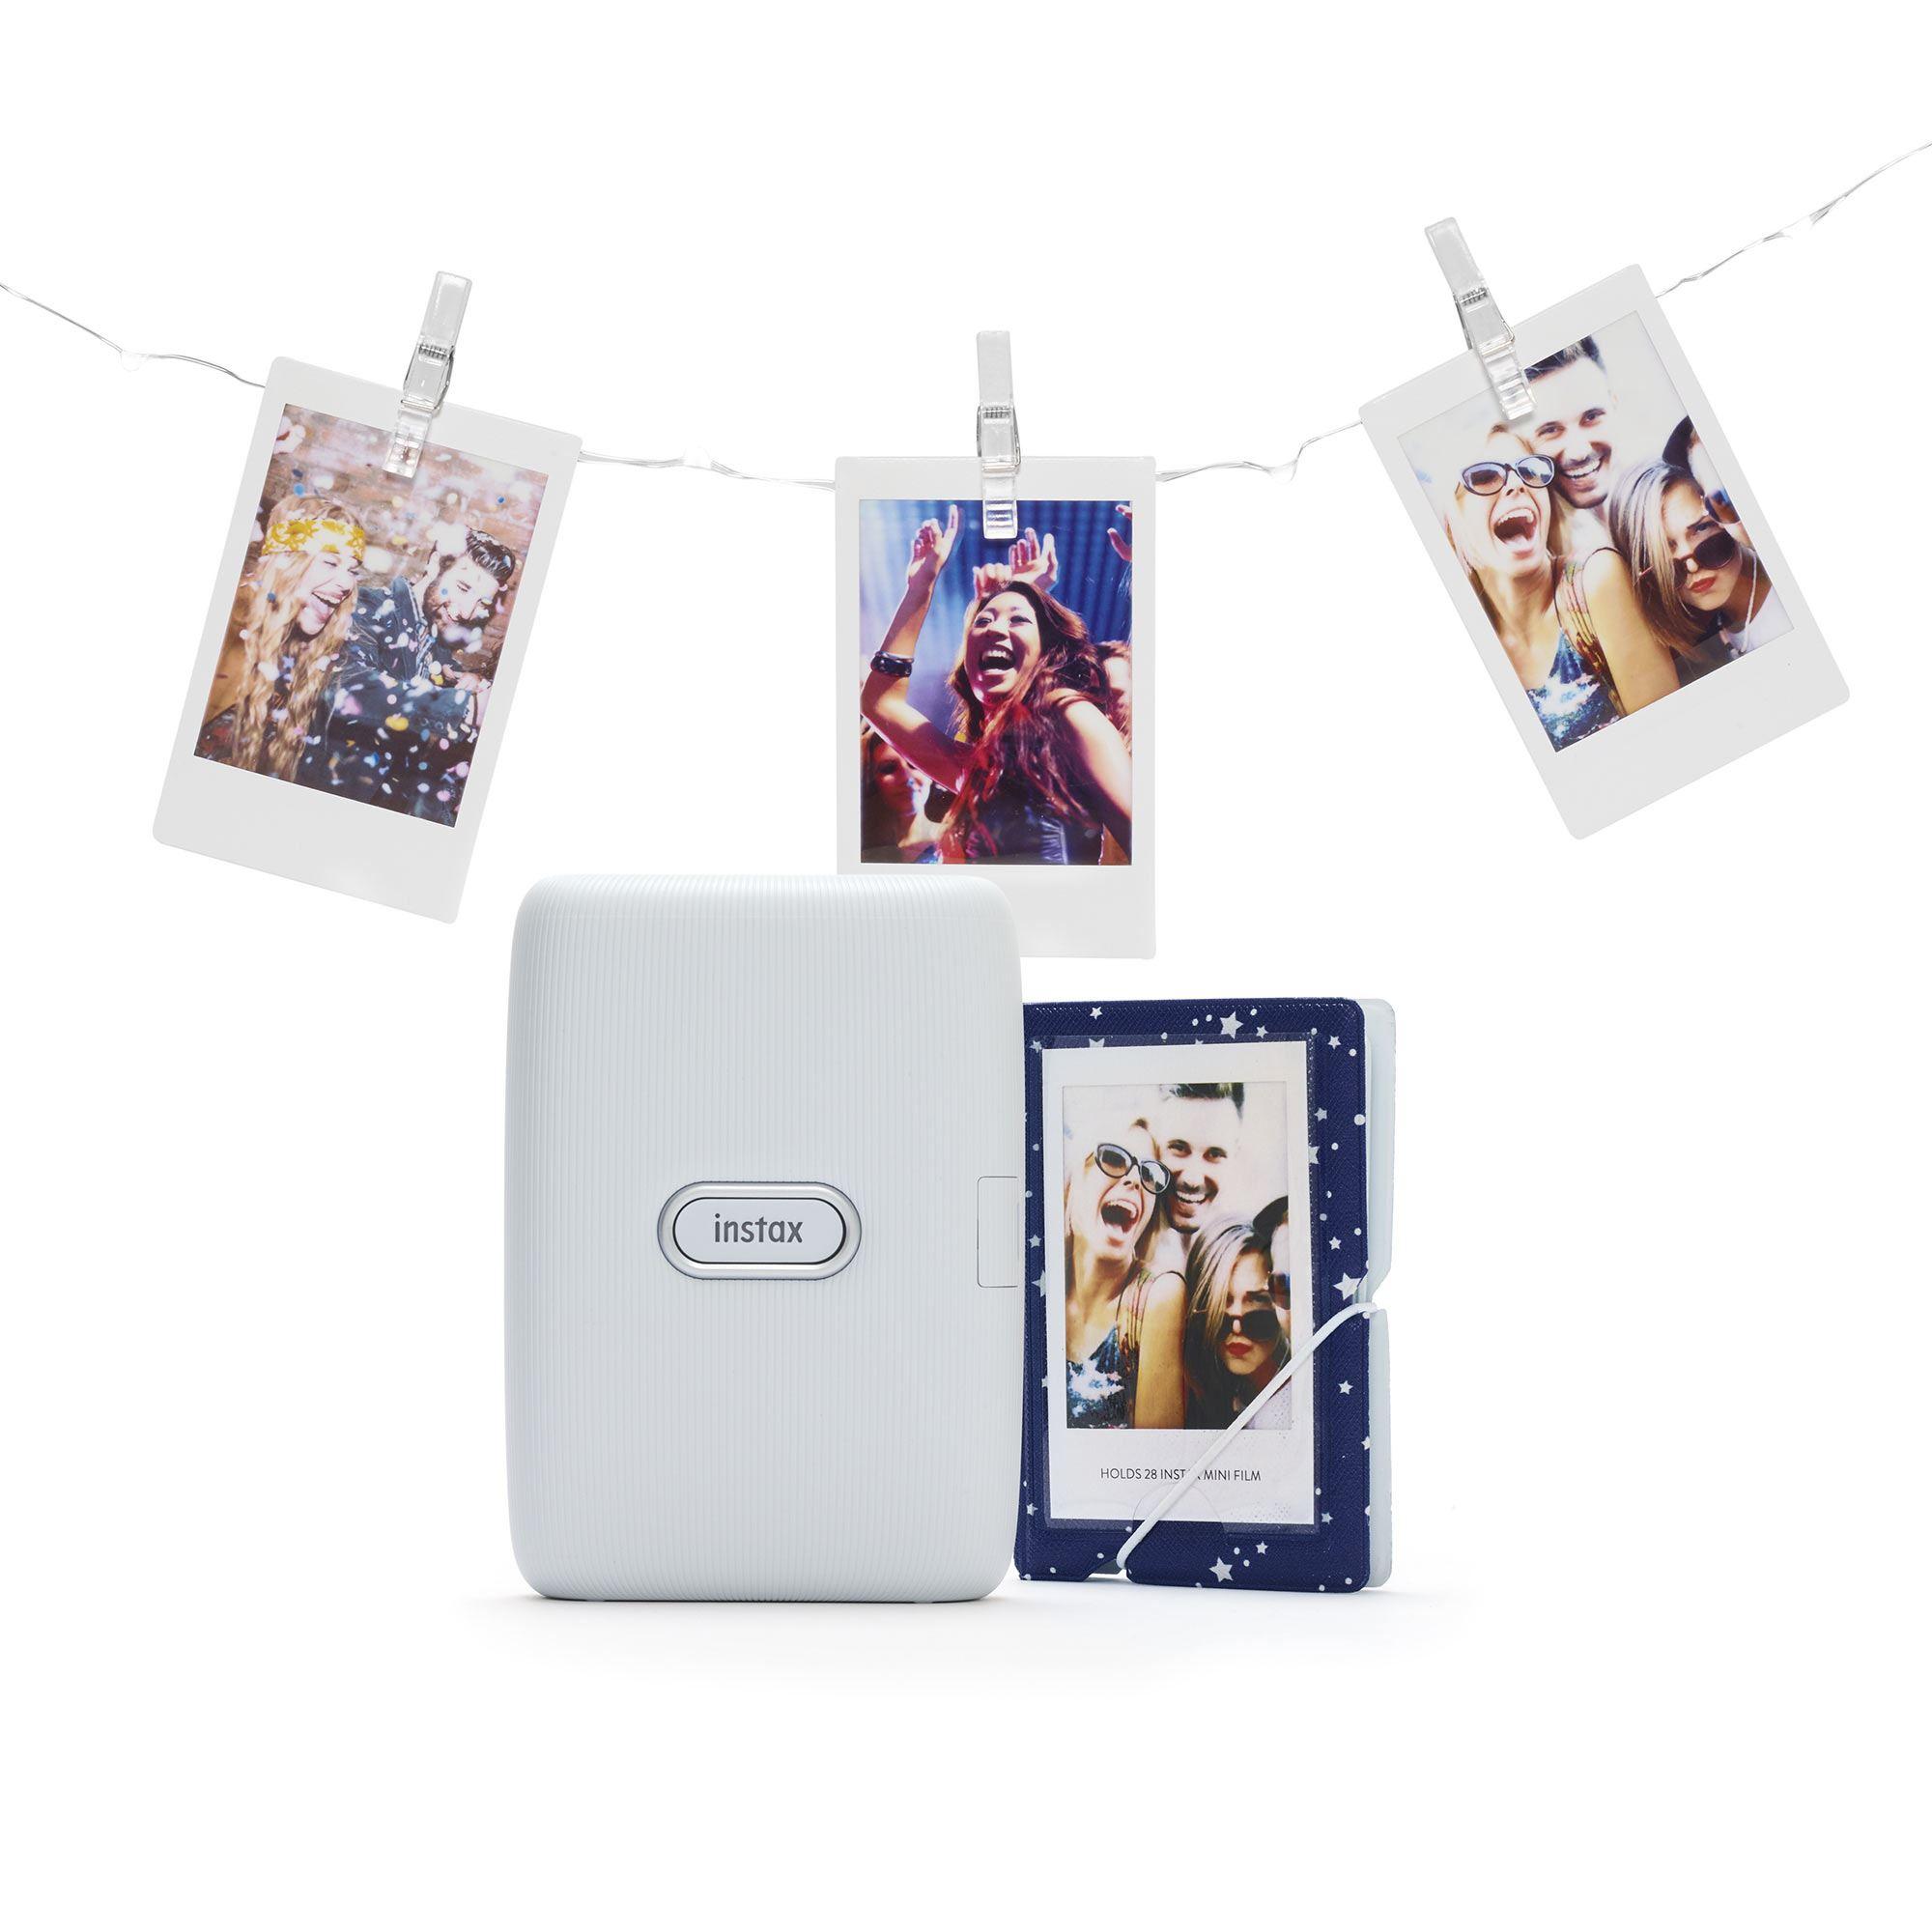 Image of Fujifilm Instax Link Instant Printer Kit - Ash White